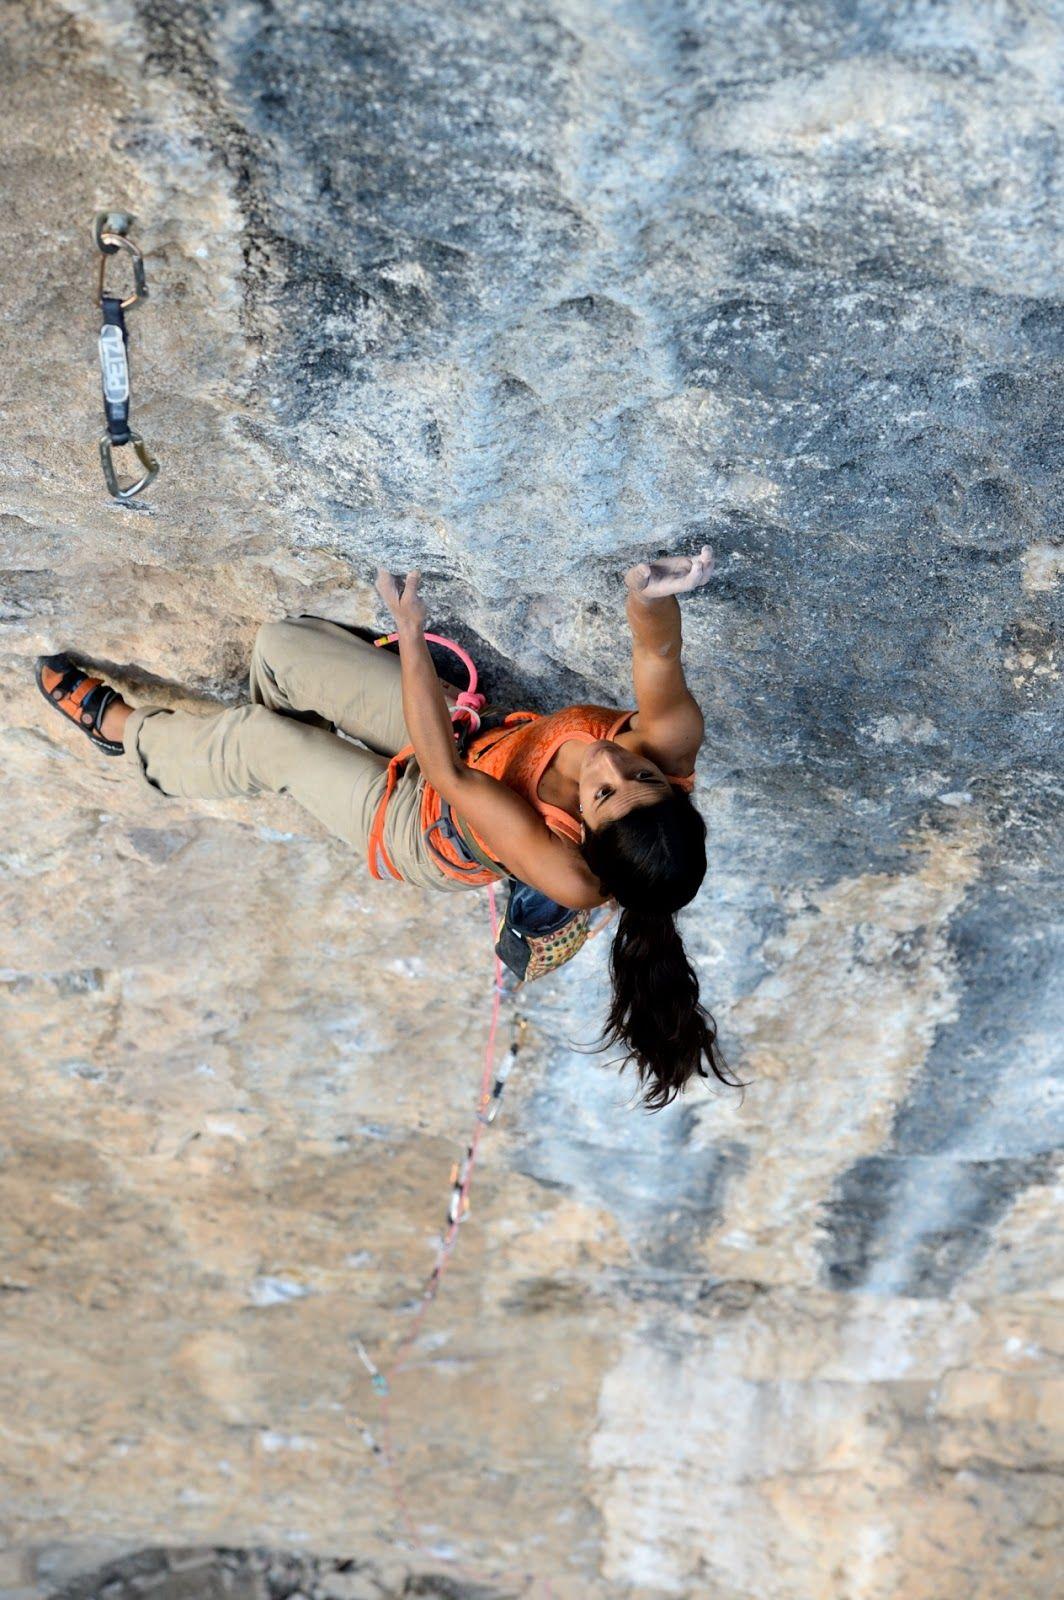 Pin By Anastasia Budash On Climbing Rock Climbing